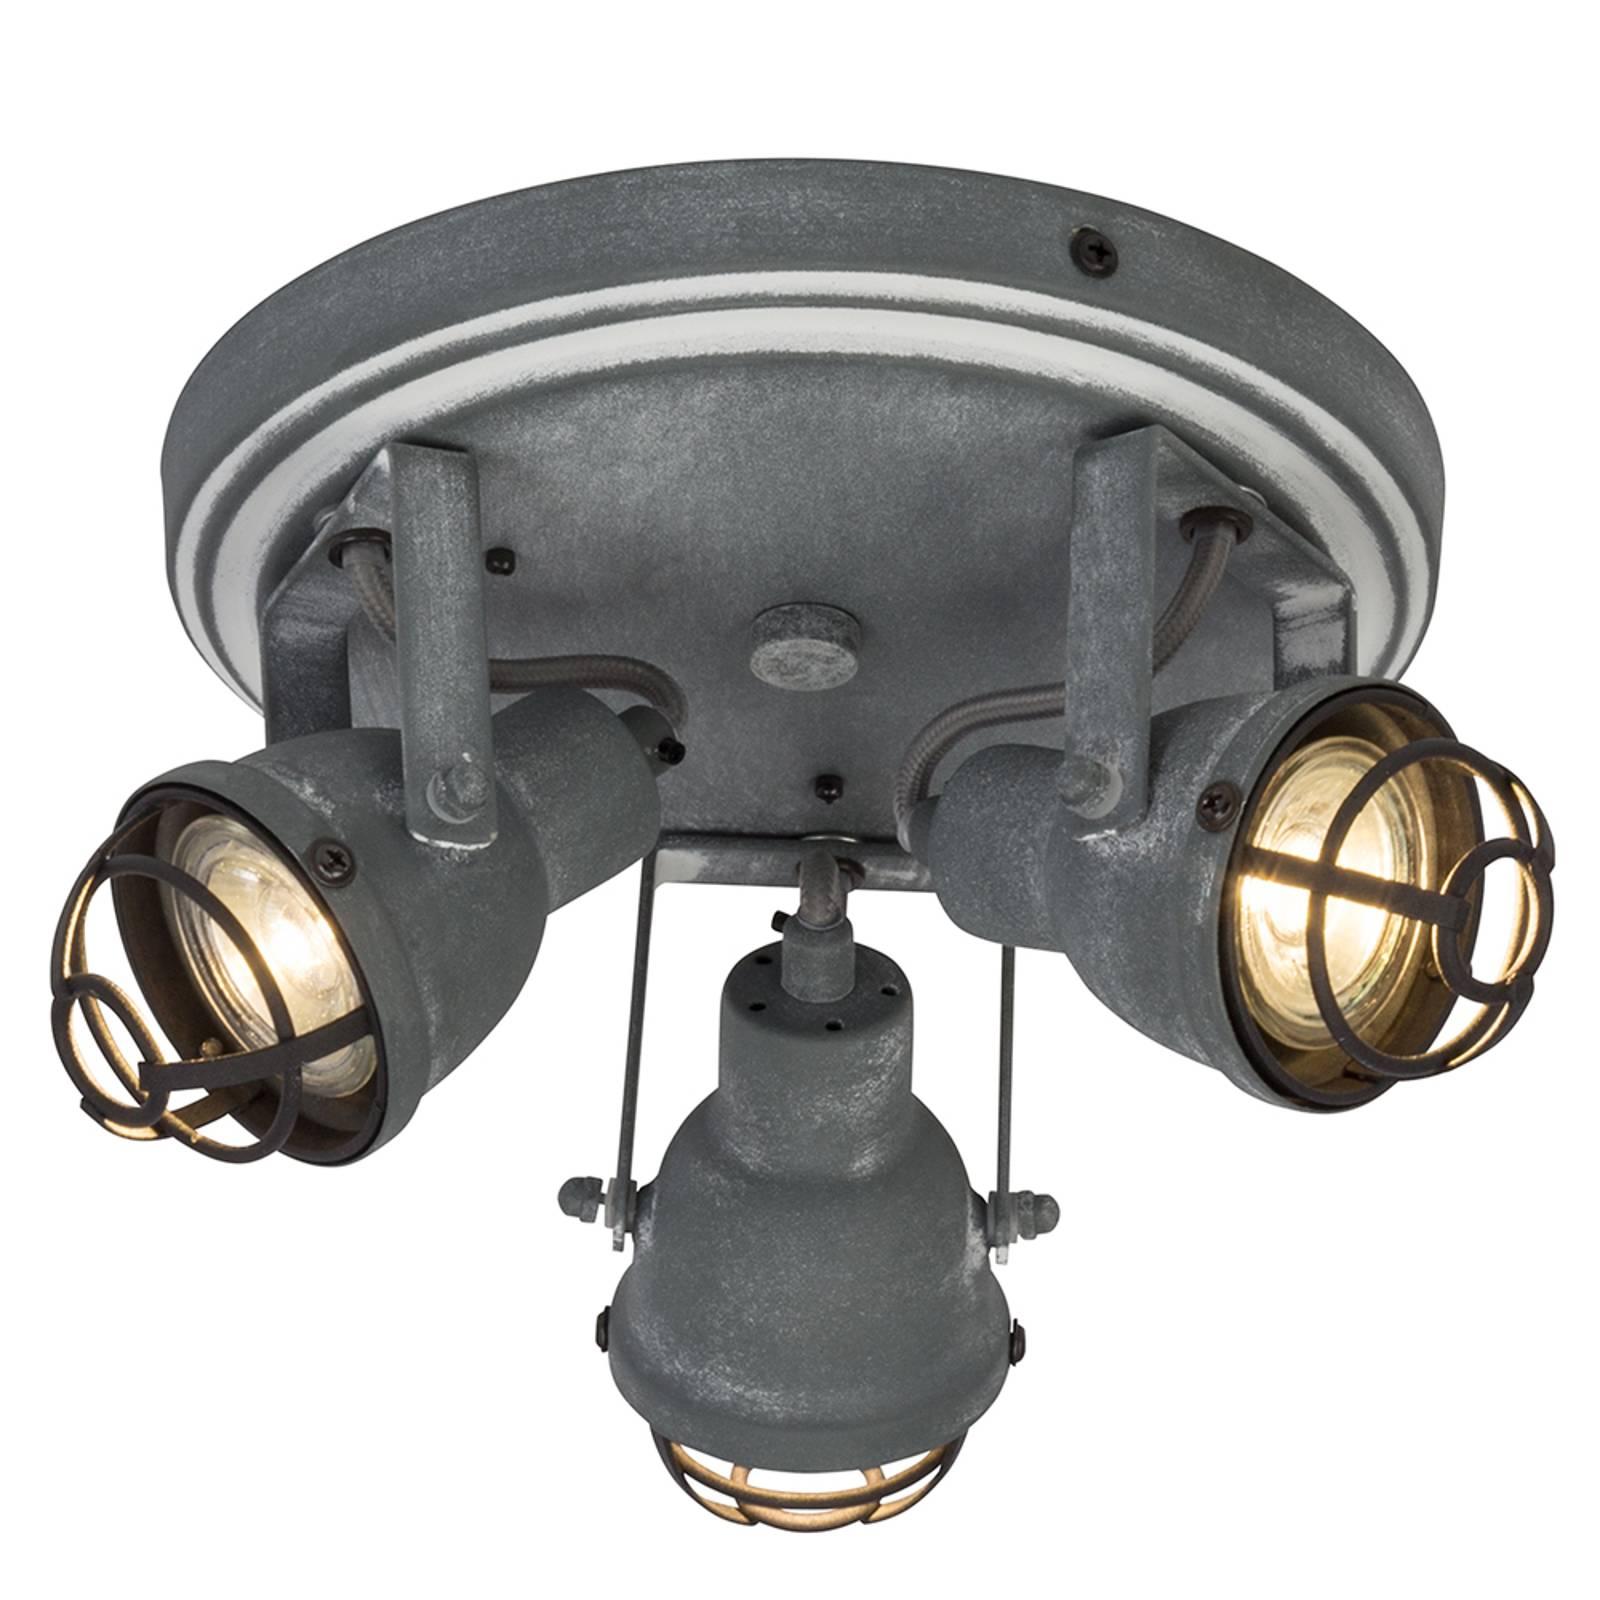 3 lichtbr. LED plafondlamp Bente